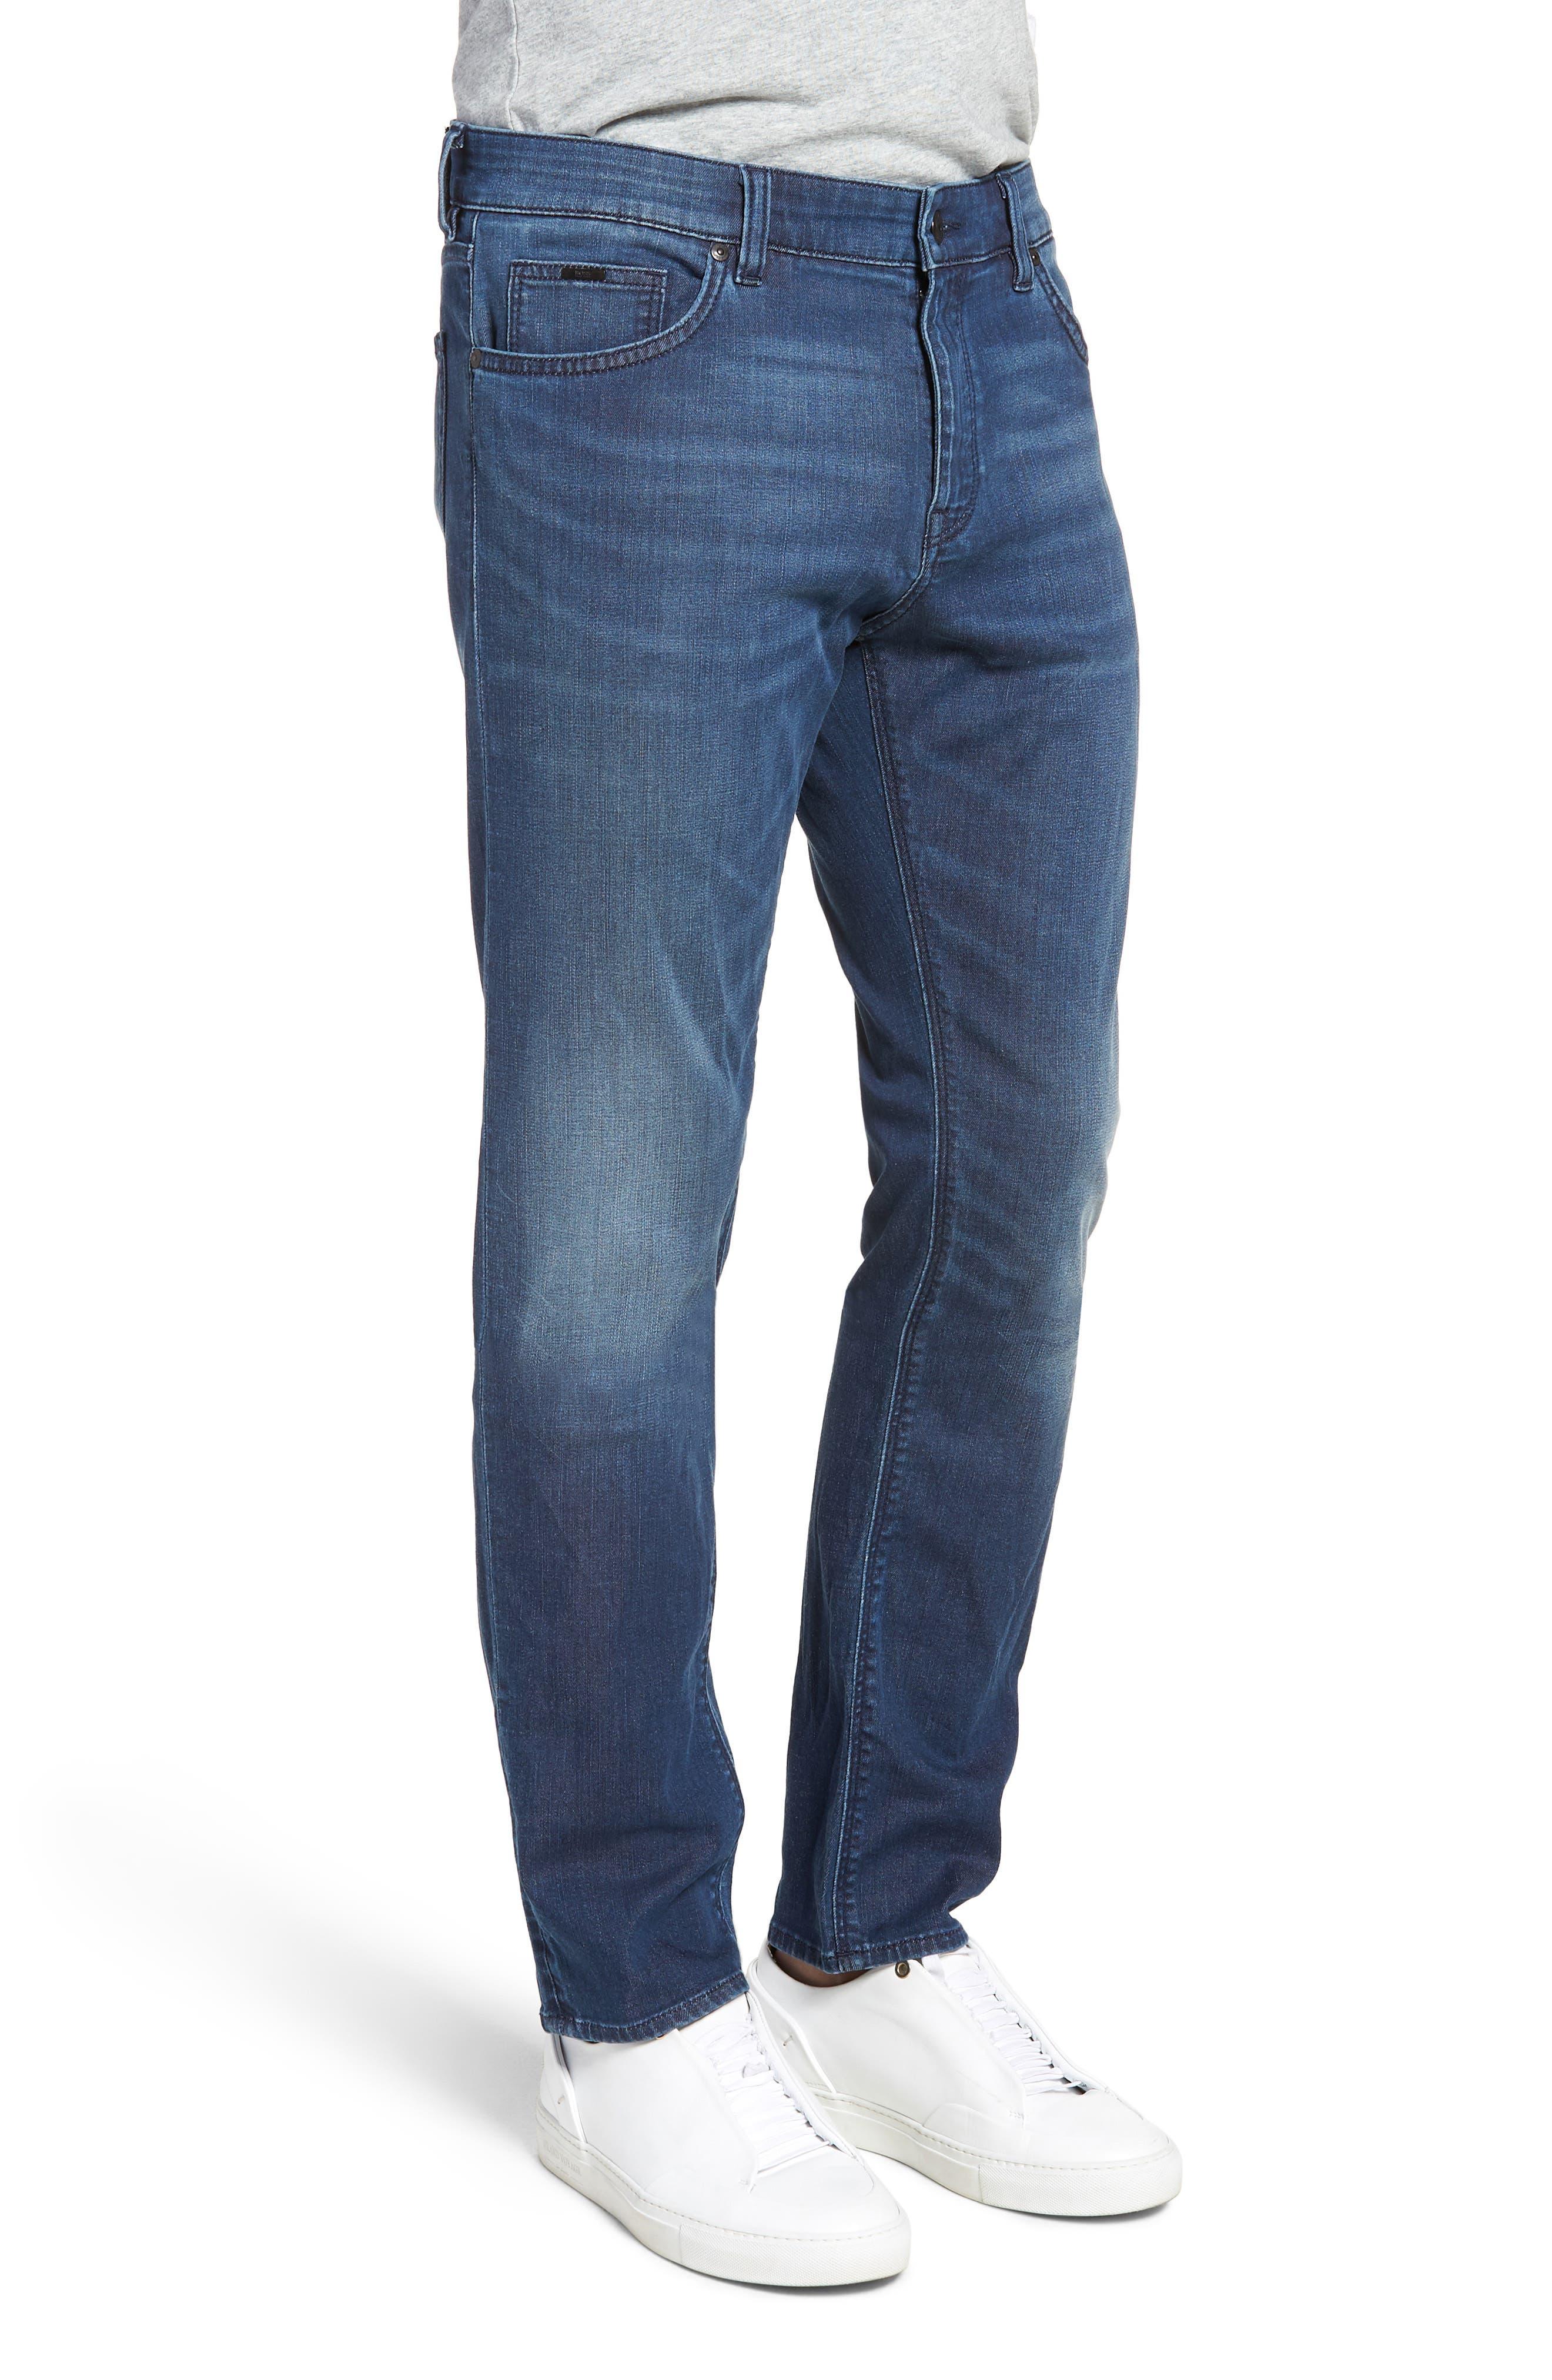 Maine Straight Leg Jeans,                             Alternate thumbnail 3, color,                             Blue